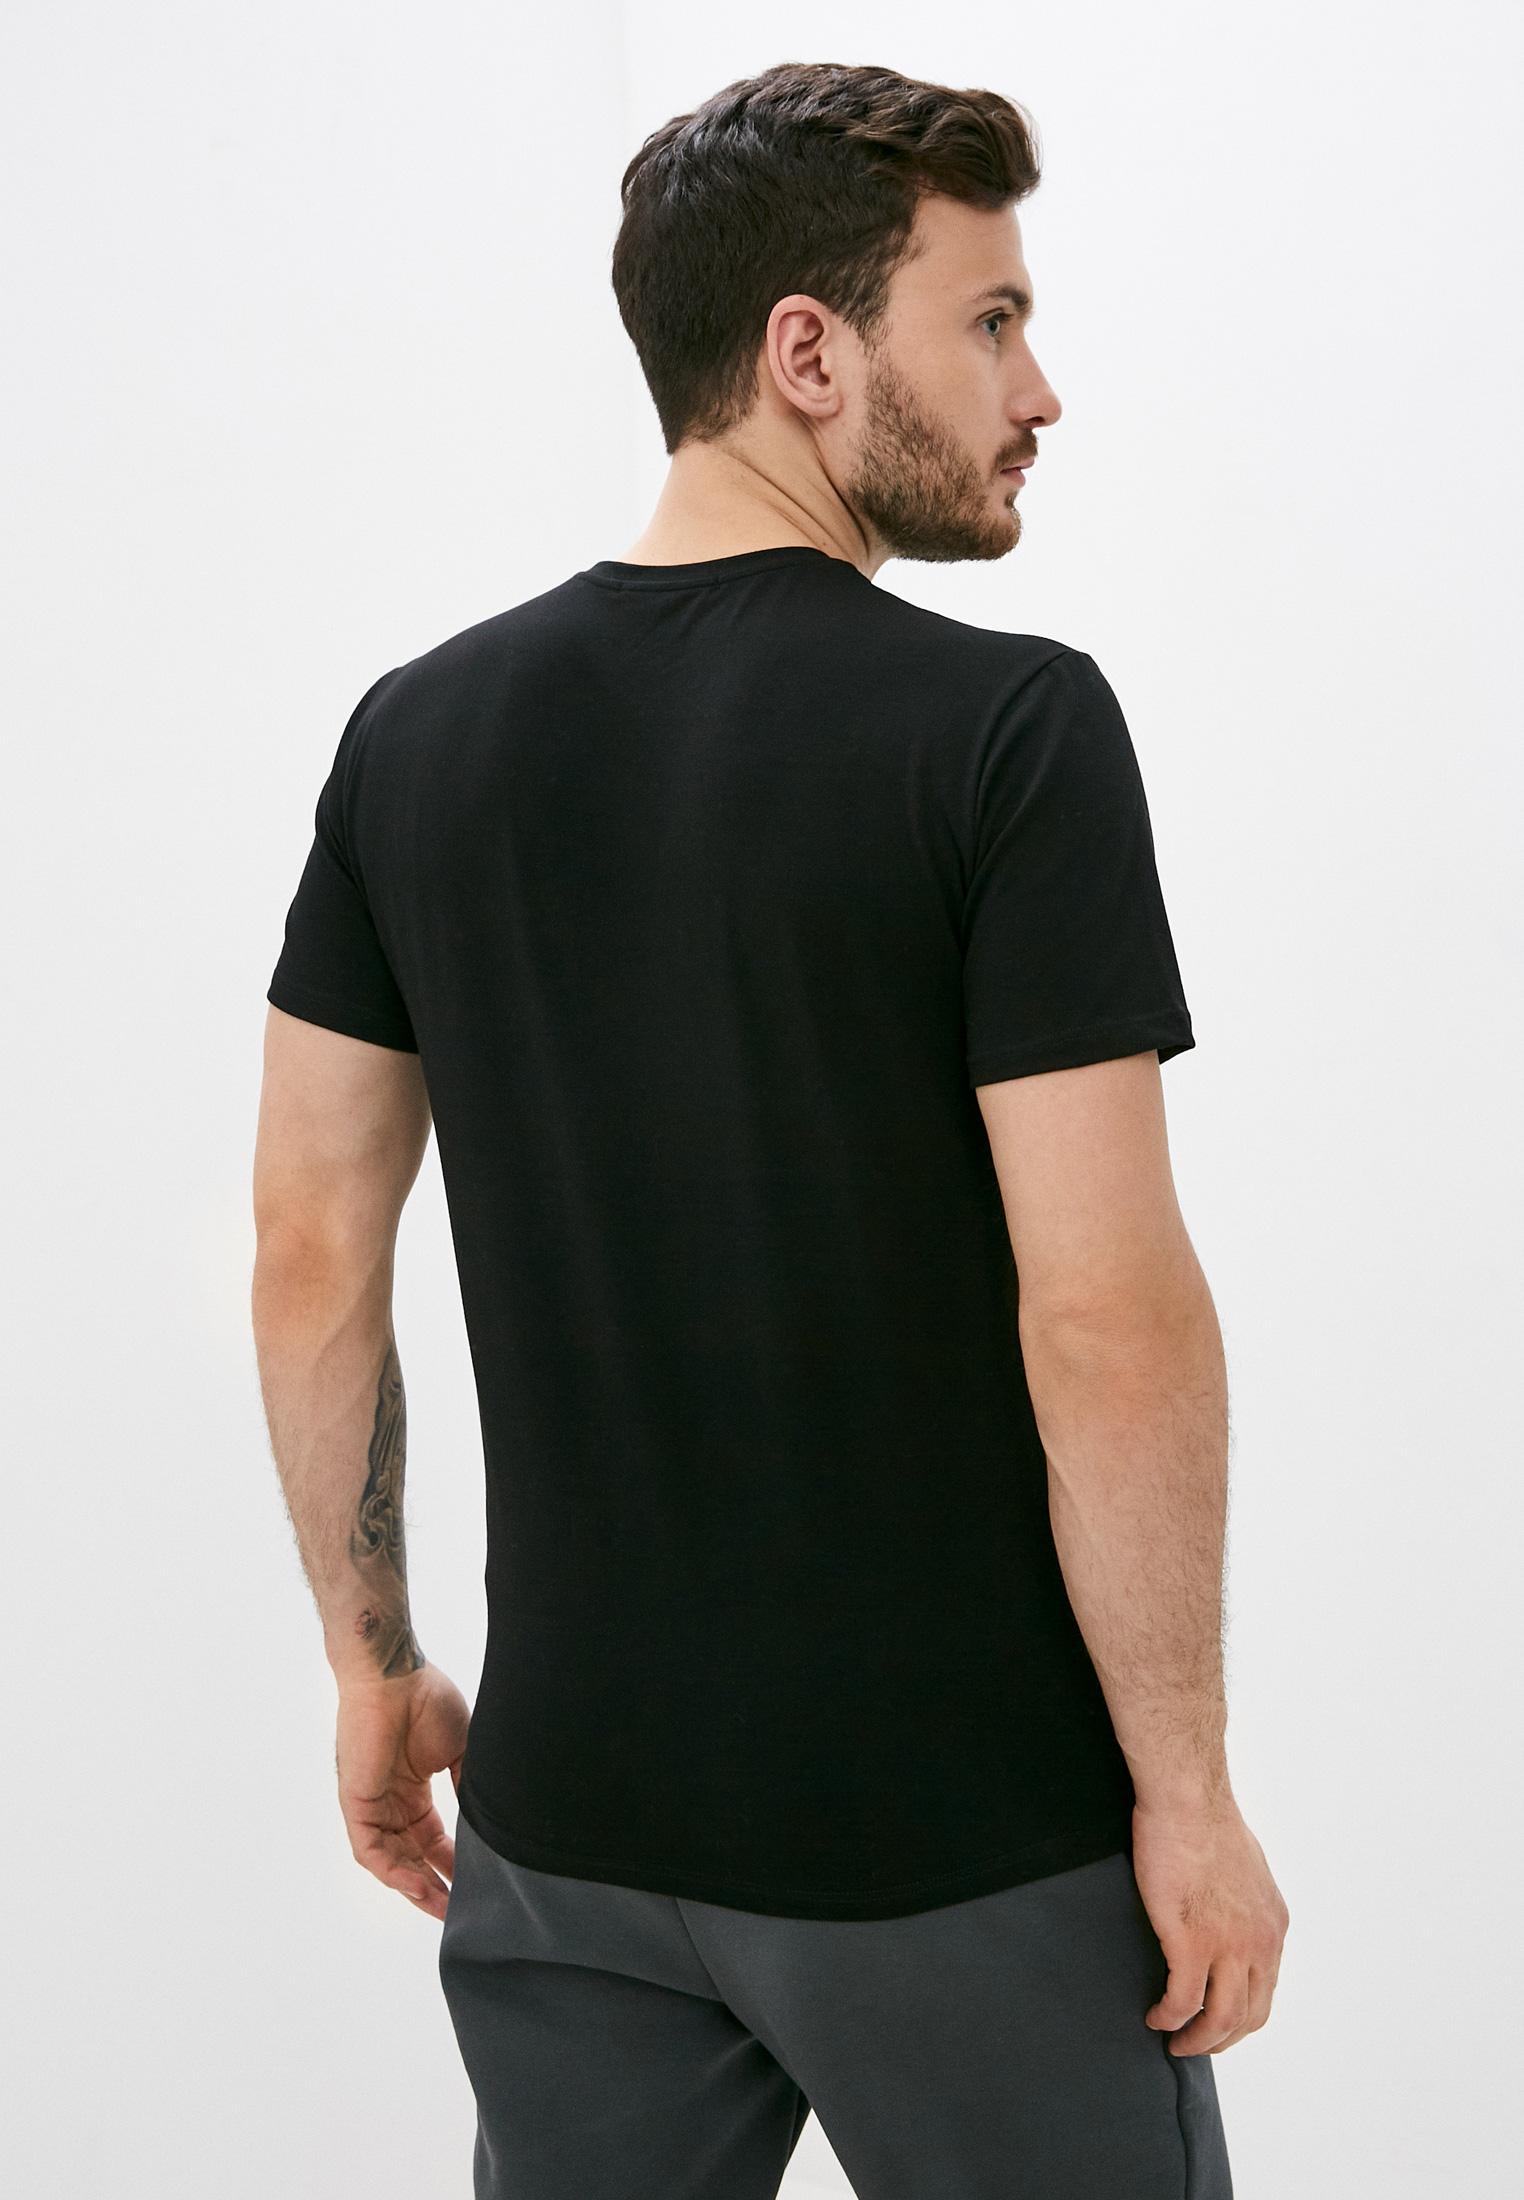 Мужская футболка Baldinini (Балдинини) TSU049992: изображение 4